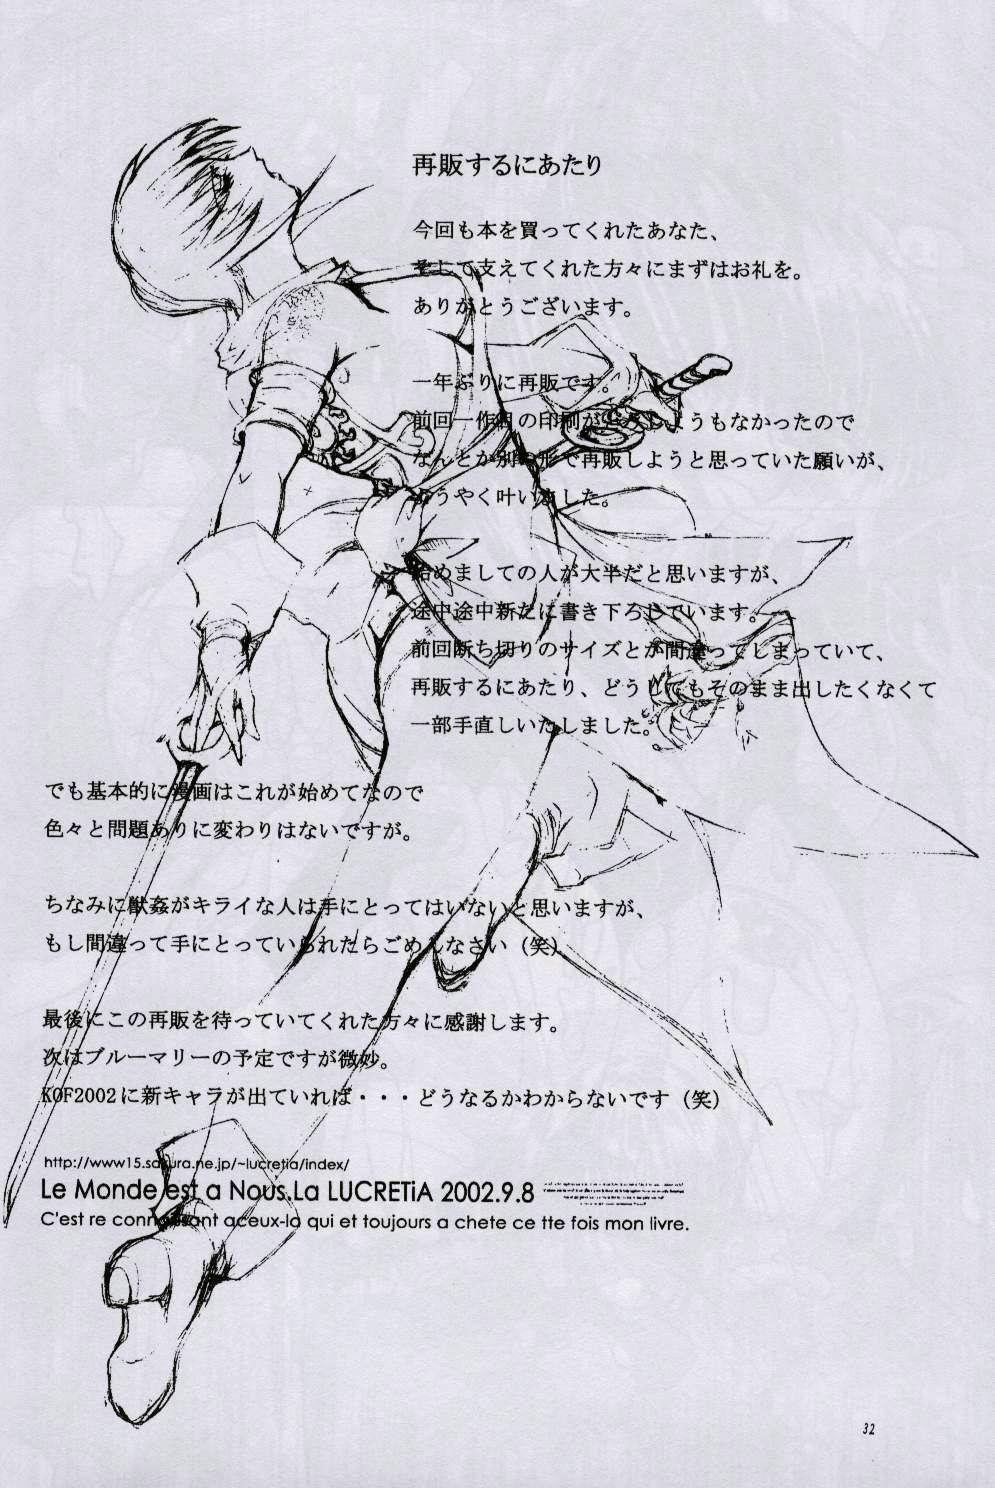 [LUCRETiA (Hiichan)] Ken-Jyuu Retouch Version - Le sexe dur avec l'animal. numero:03 (Samurai Spirits) 29